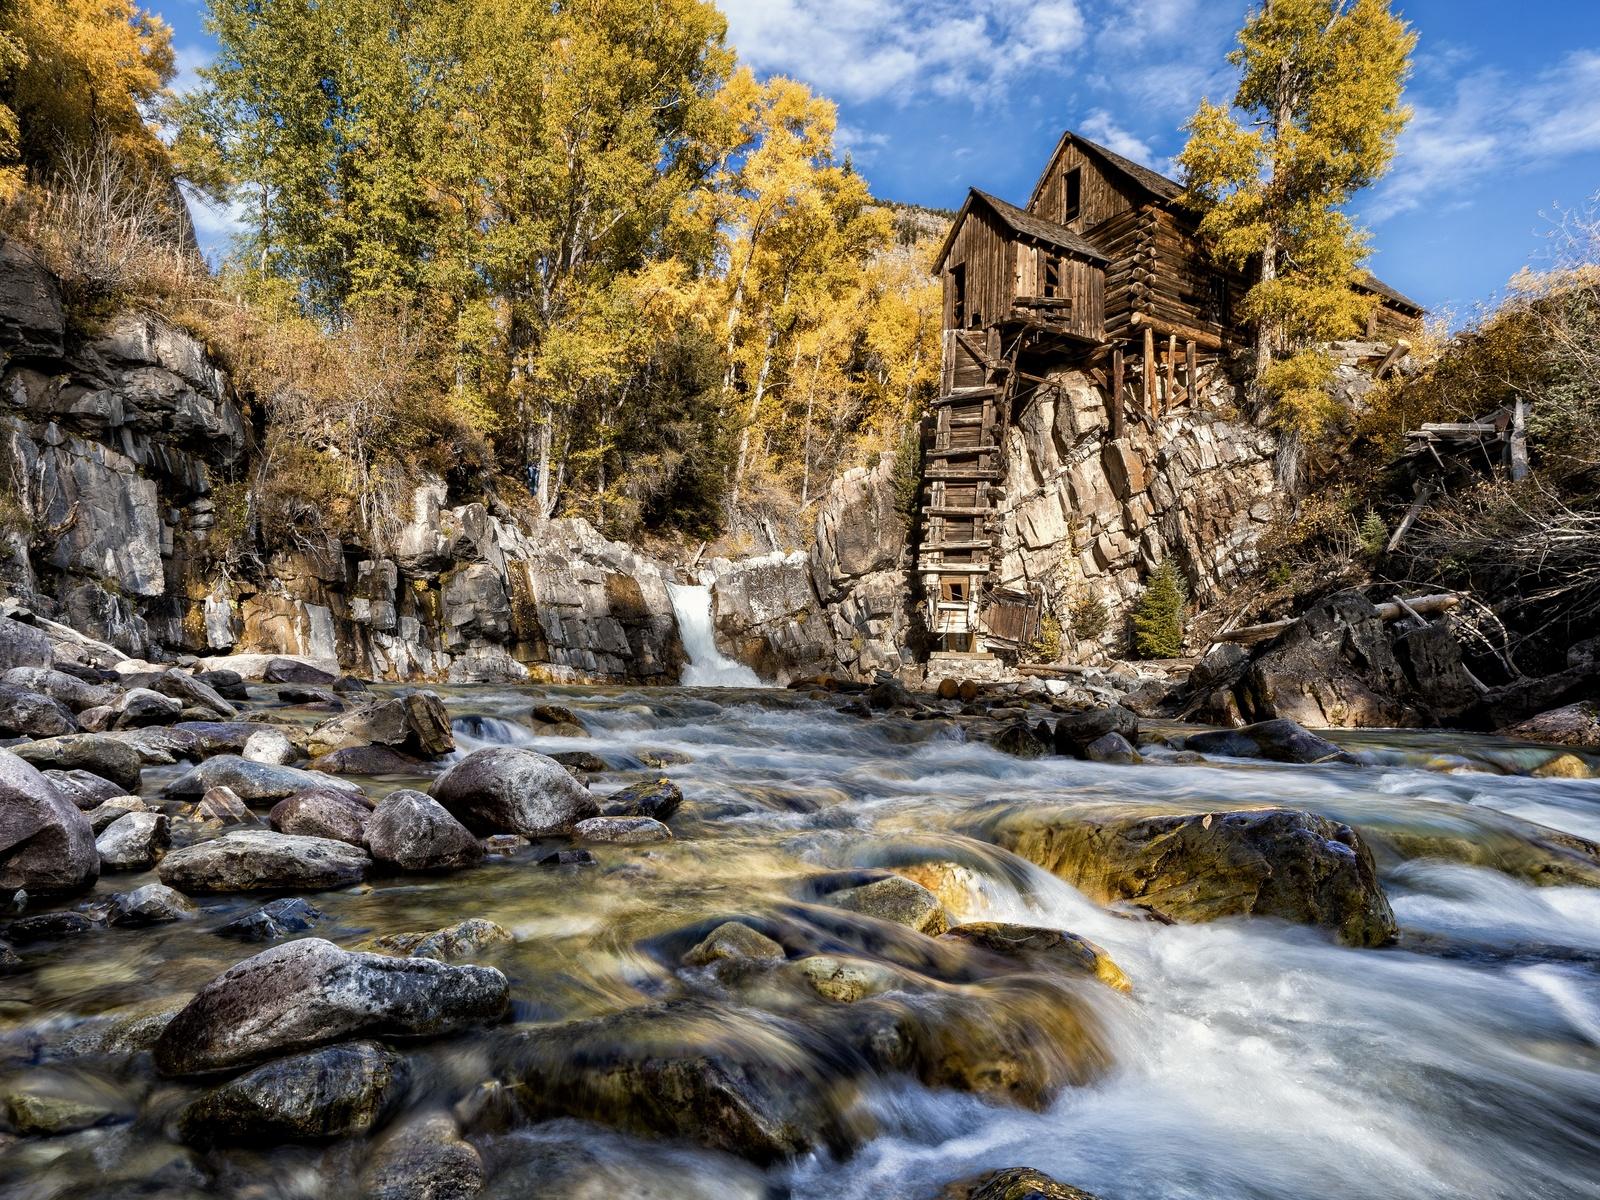 река, камни, избушка